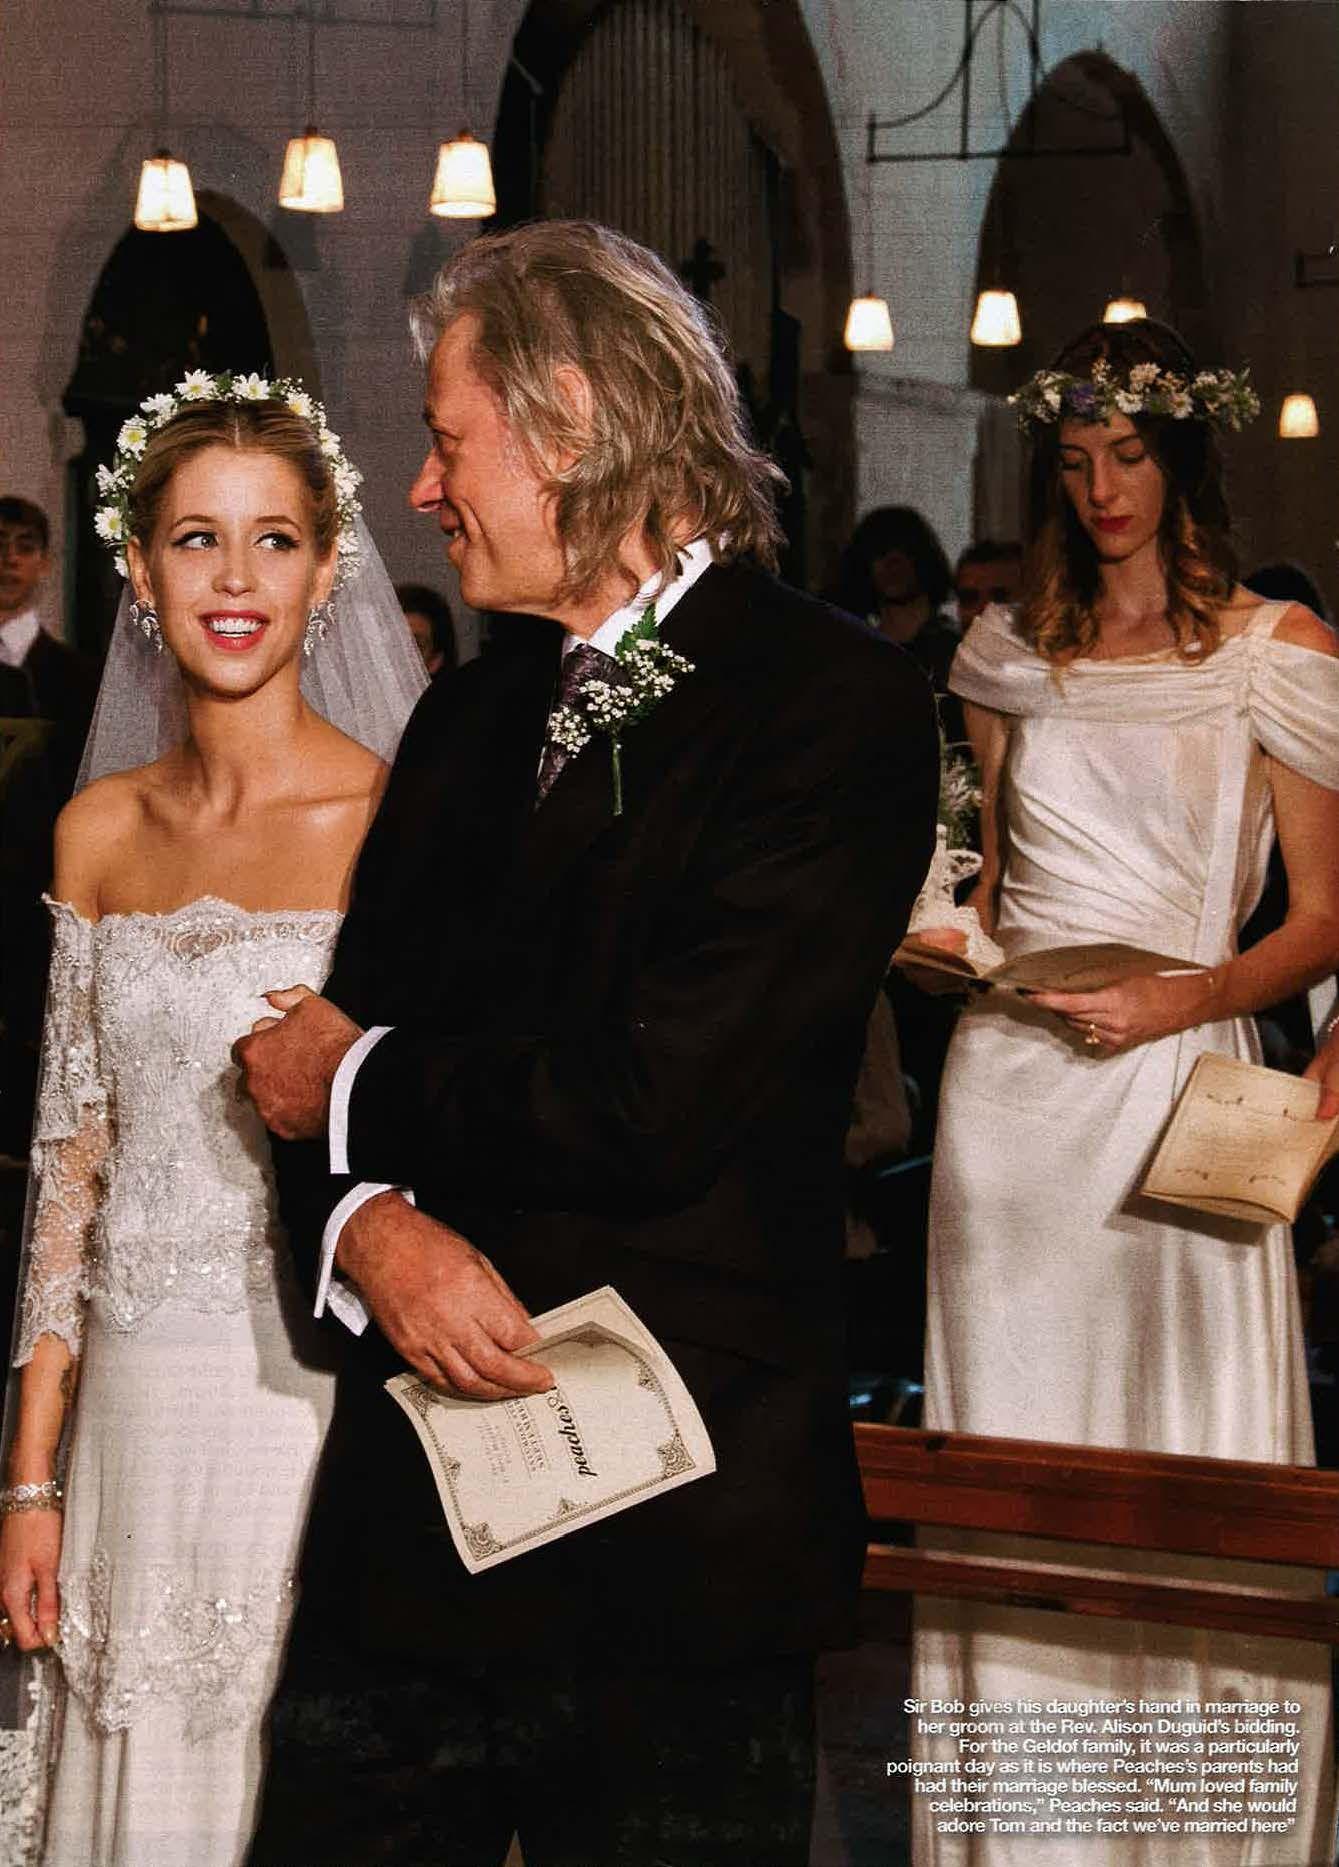 Peaches geldof wedding dress  Beautiful Peaches with her special Alberta Ferretti wedding dress